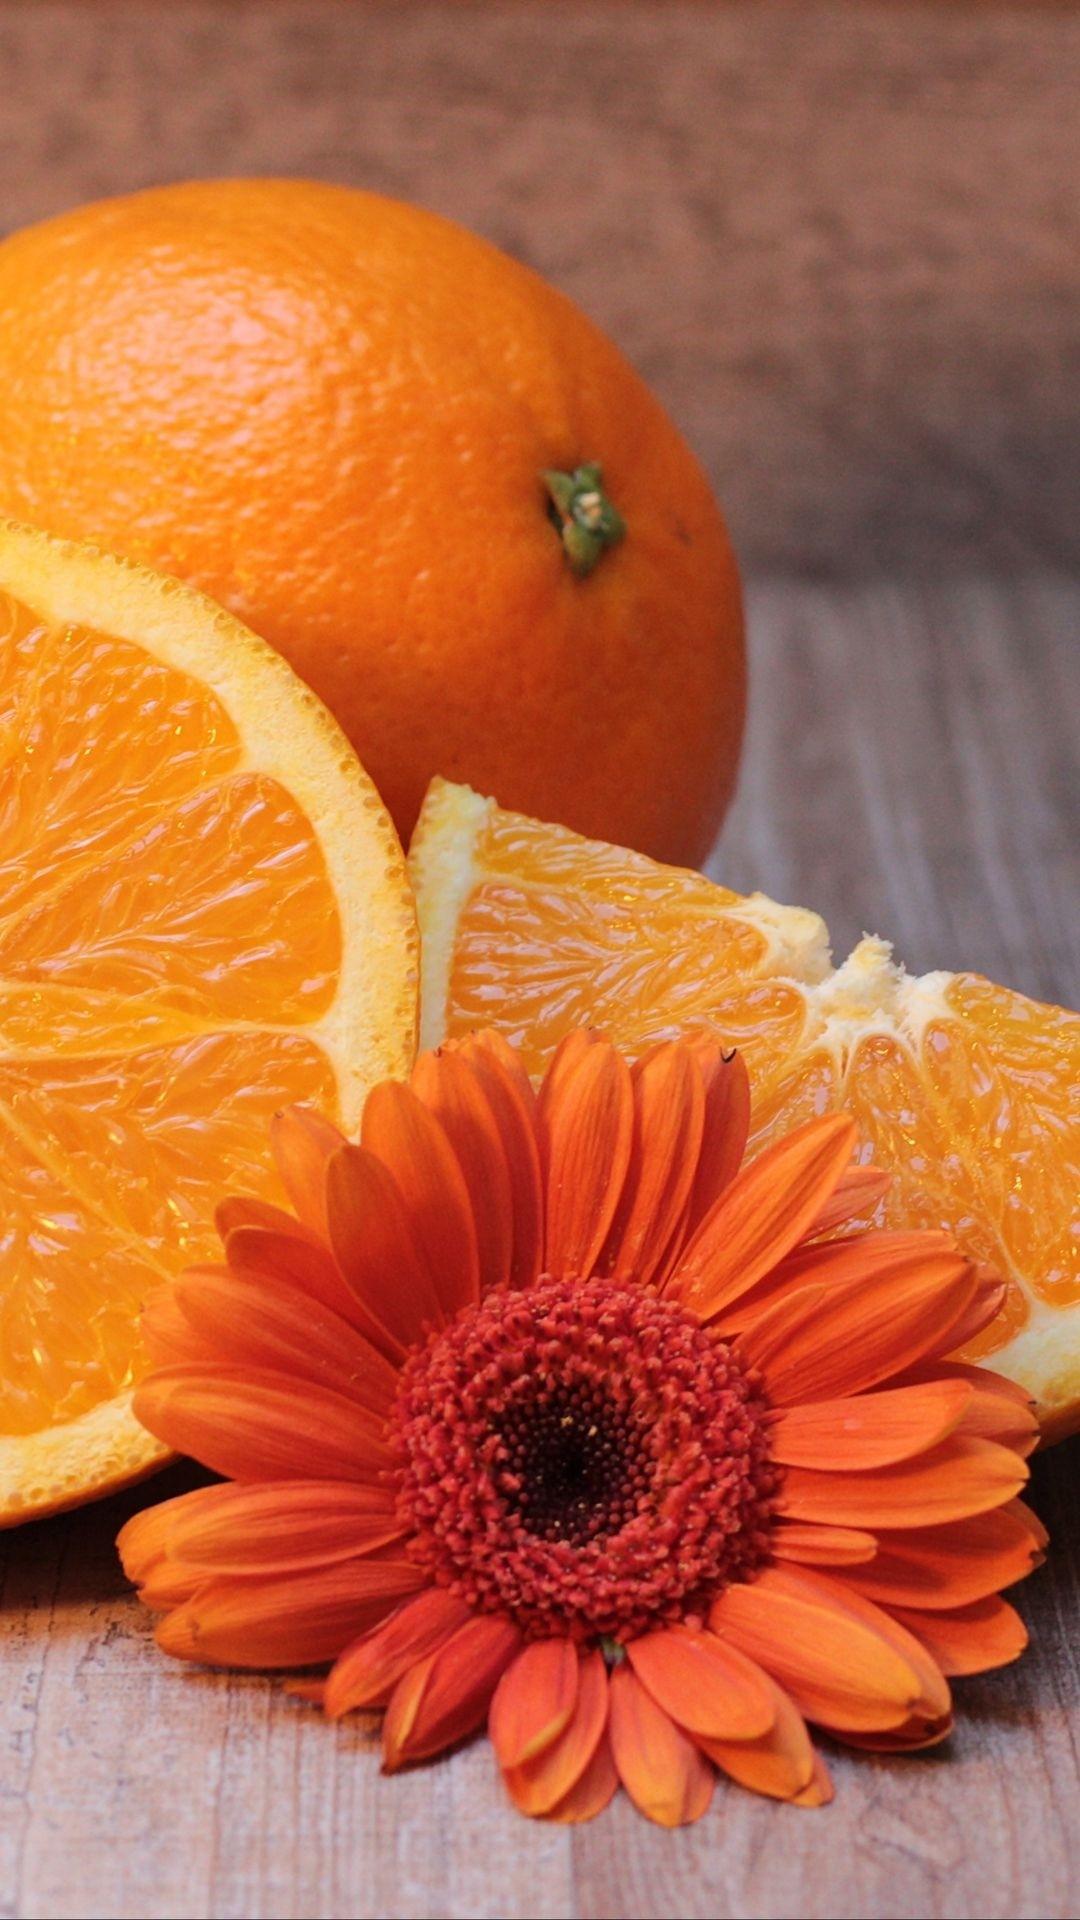 Orange iphone 7 wallpaper